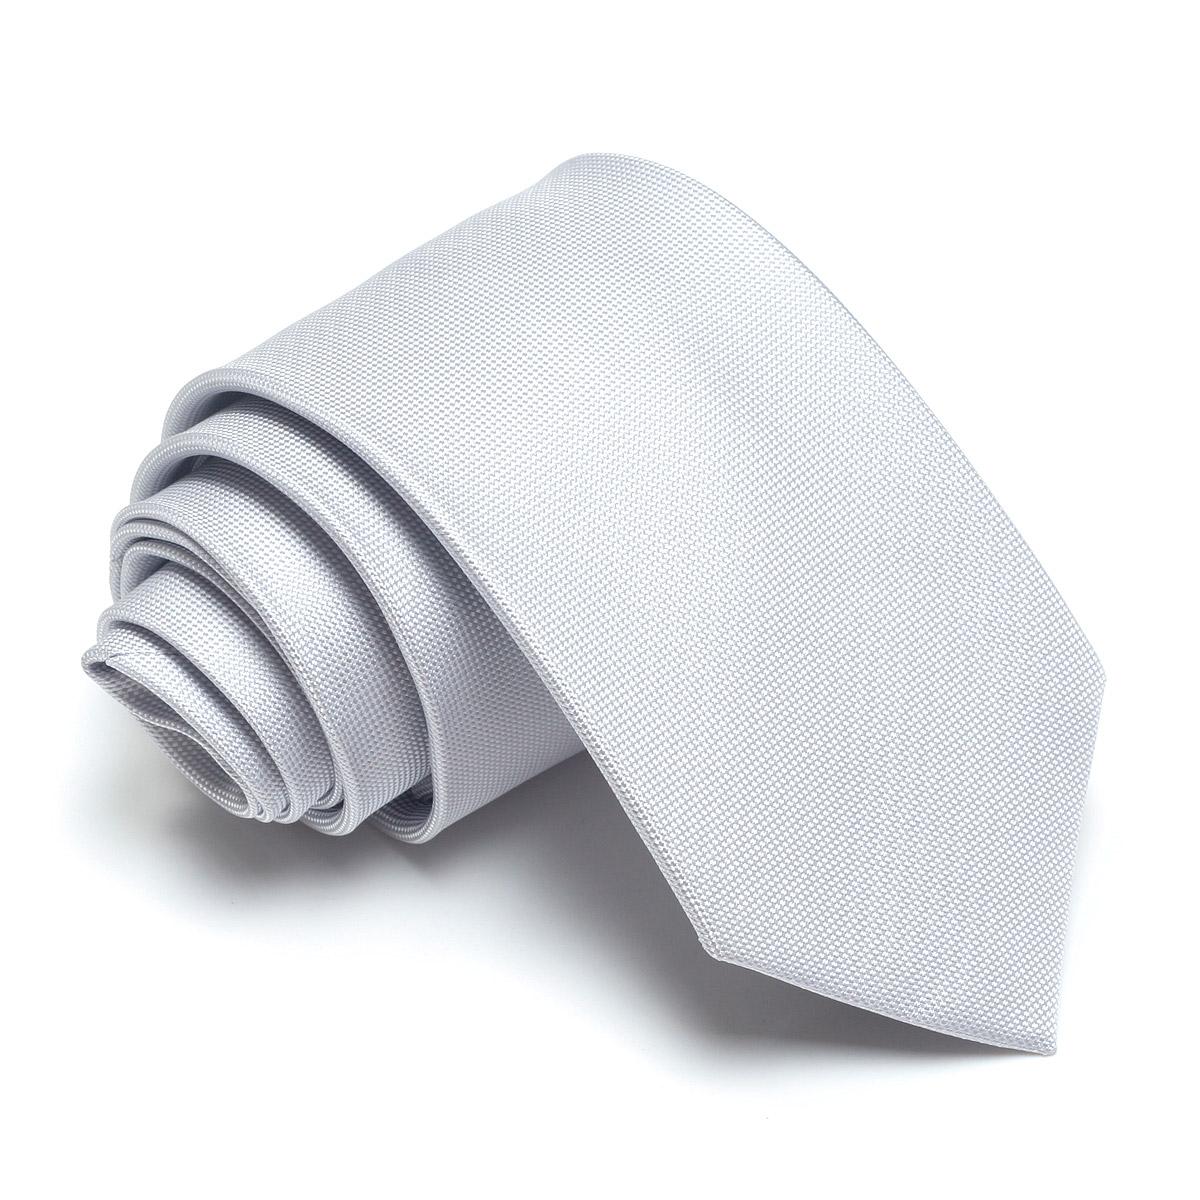 Цвет: серебристо-белый